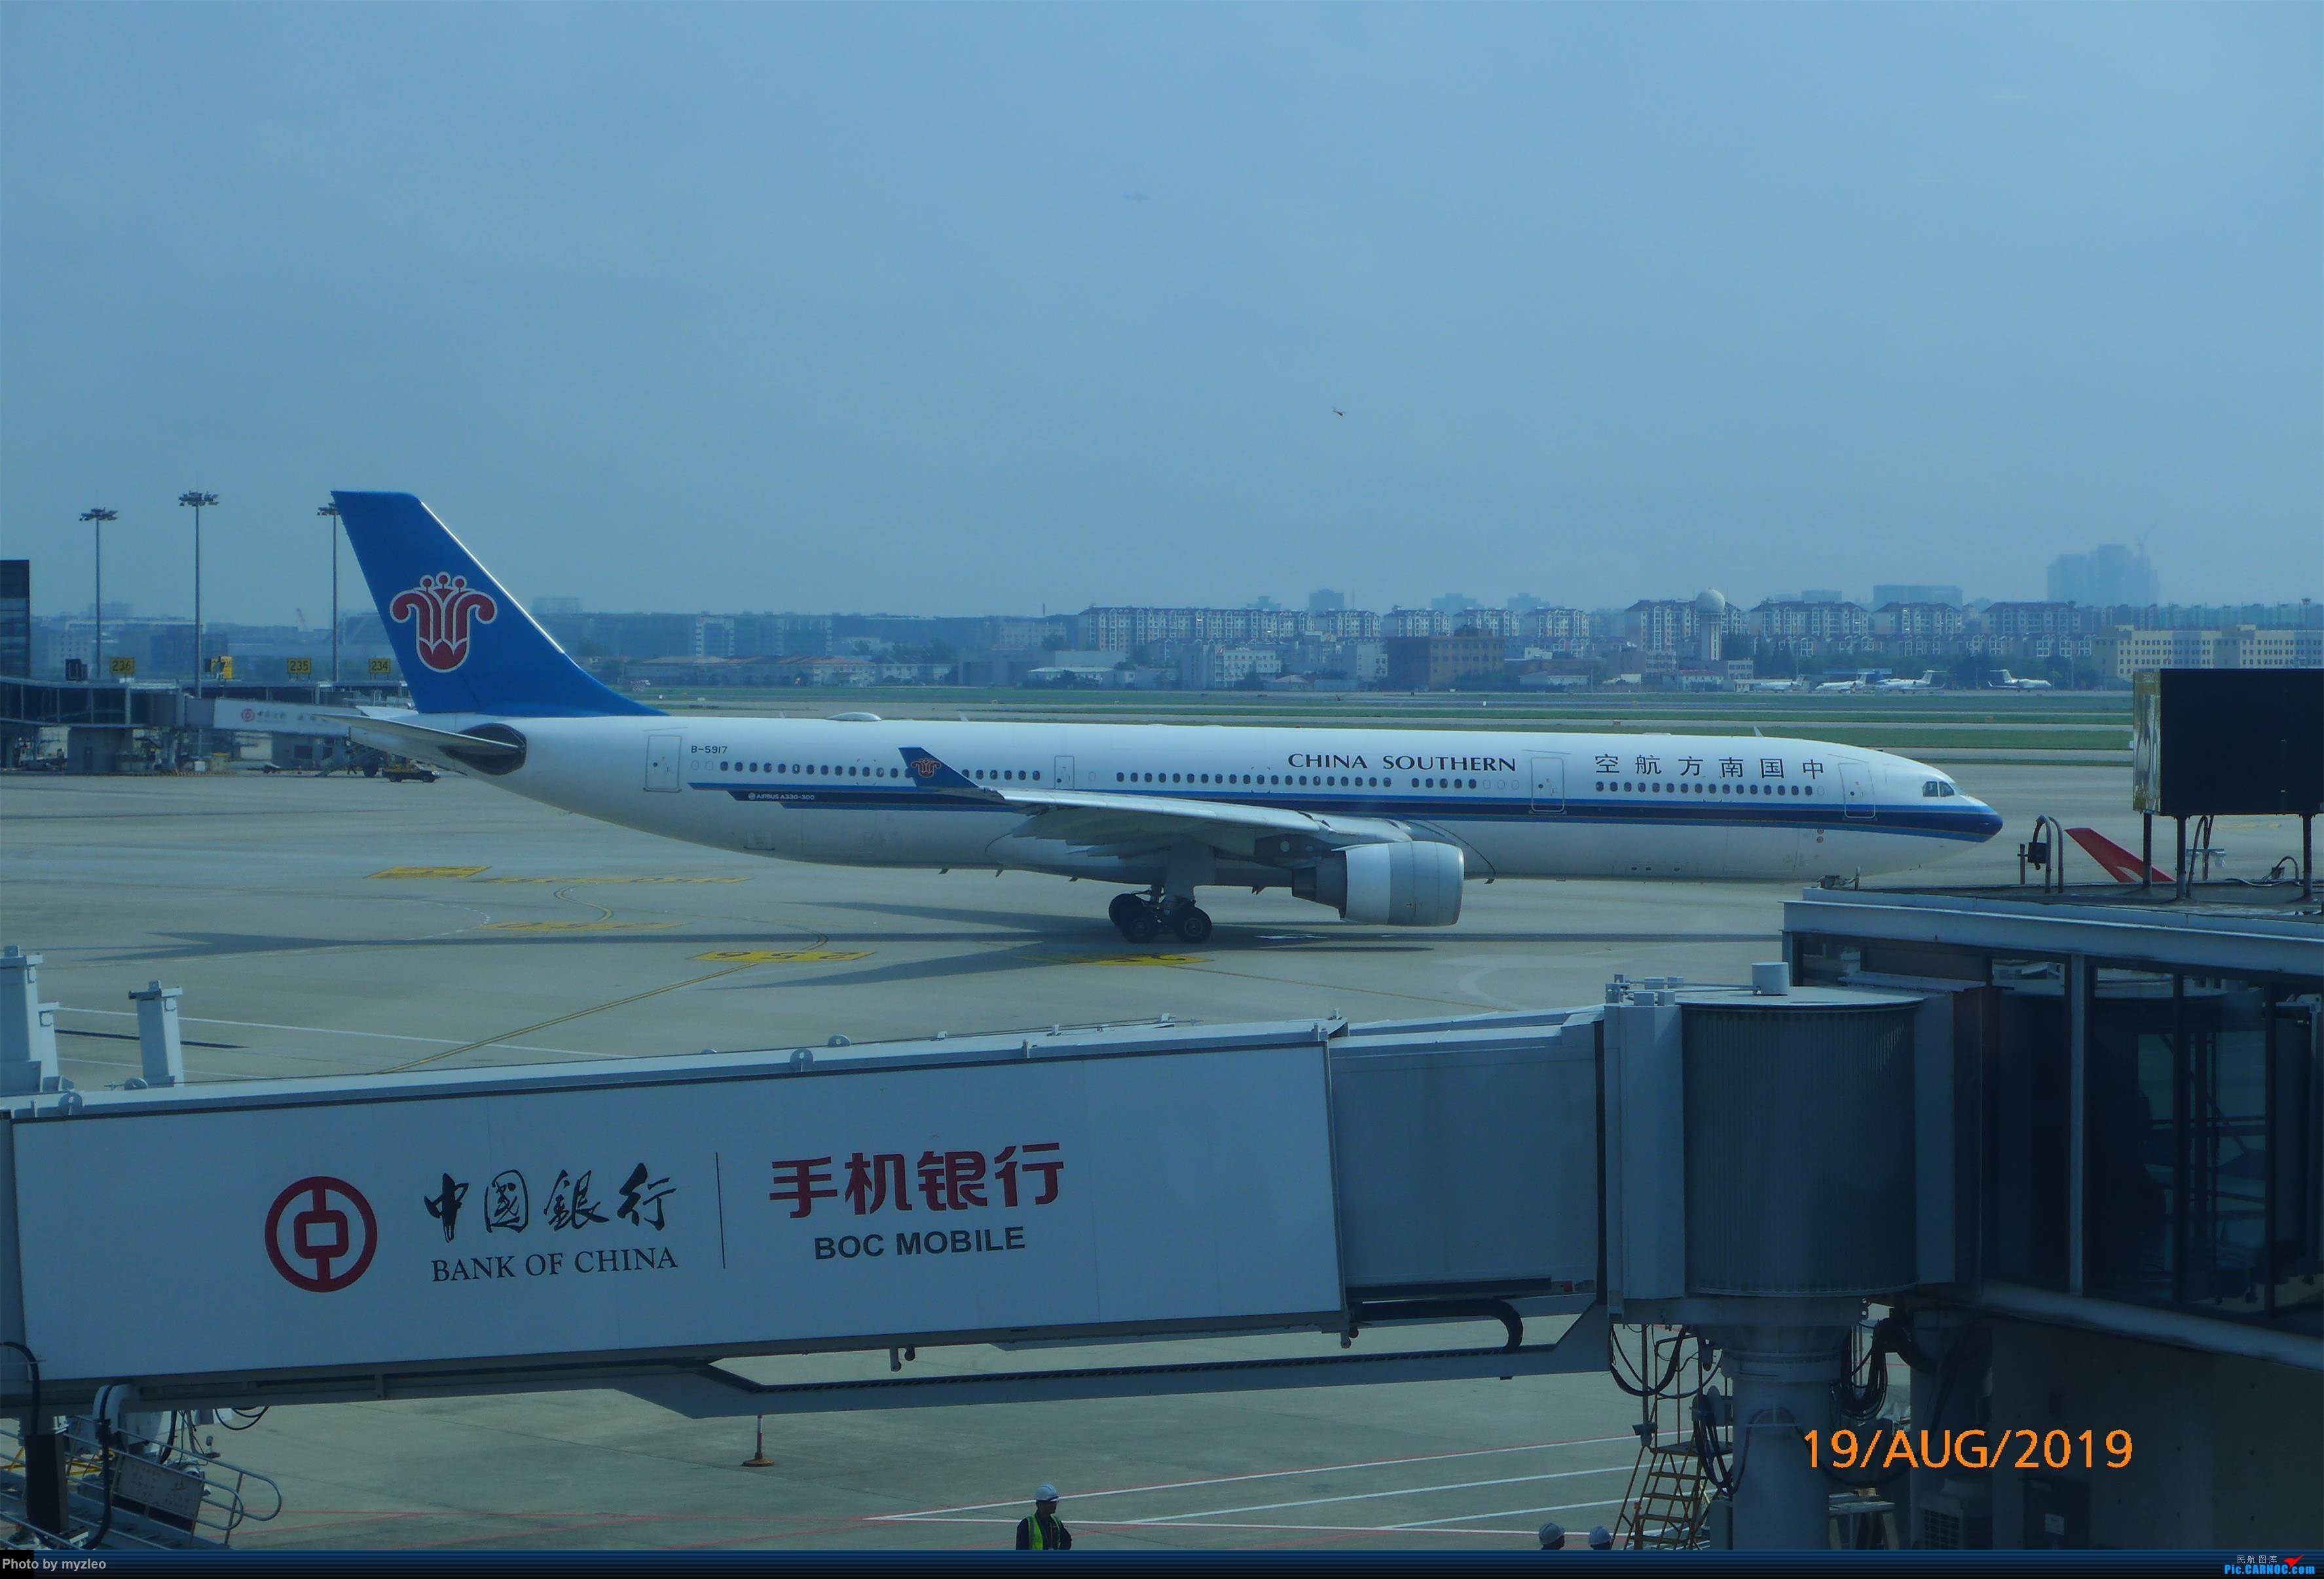 Re:[原创]【myzleo的游记5.1】梦圆一九(1)首搭国航359,北京城里到处走 AIRBUS A330-300 B-5917 中国上海虹桥国际机场